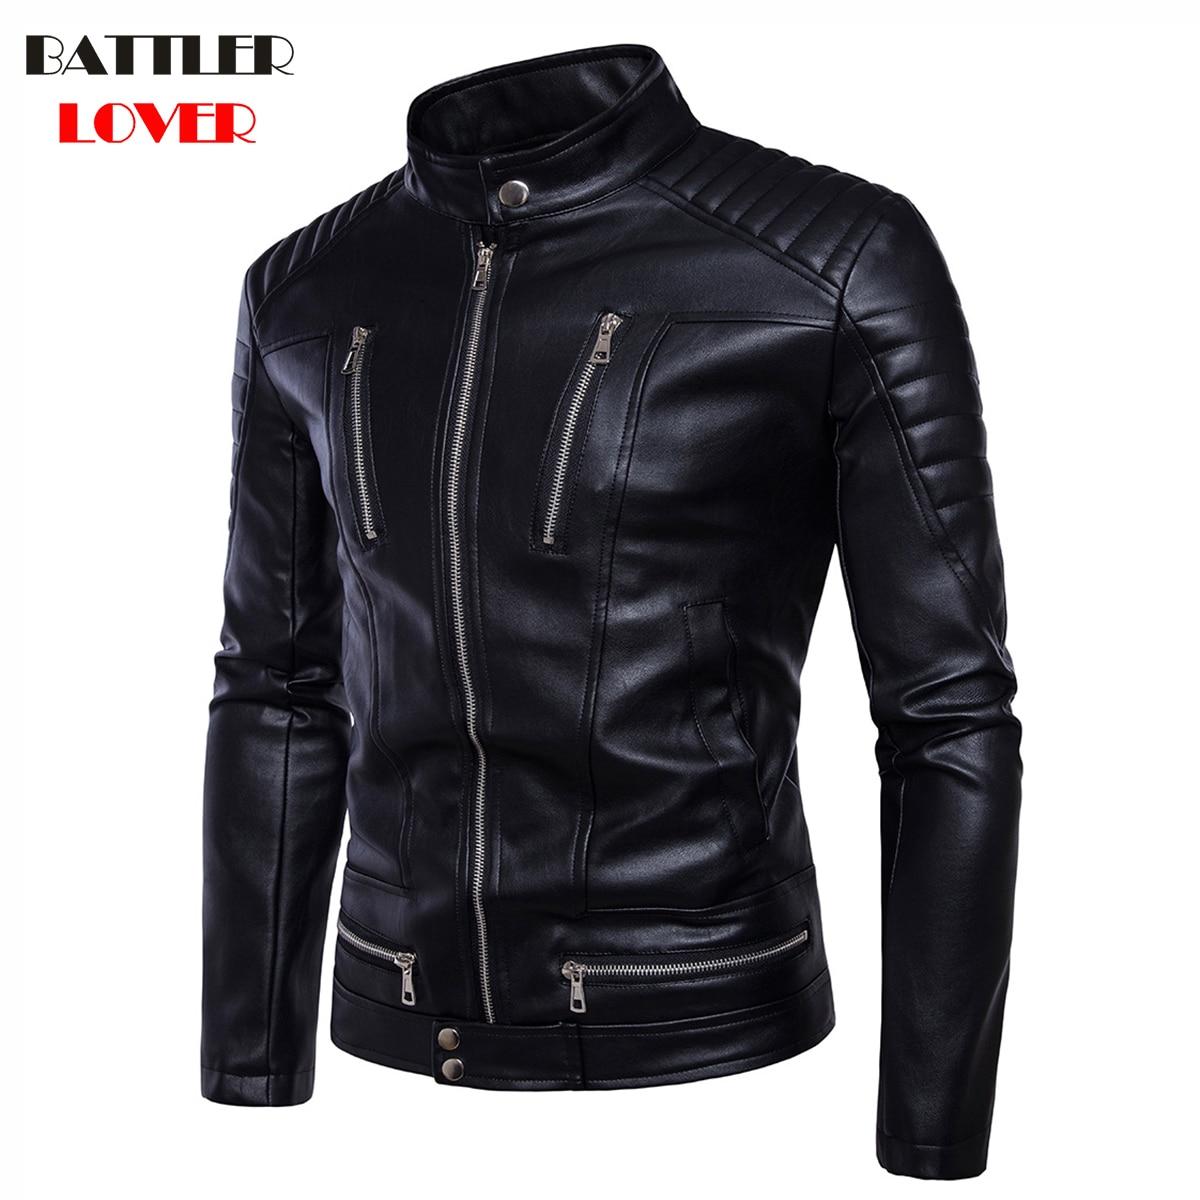 2018 Genuine Leather Jackets Mens Bomber Winter Motorcycle Jacket Men Natural Leather Windbreaker Moto Biker Coat Hombre Clothes